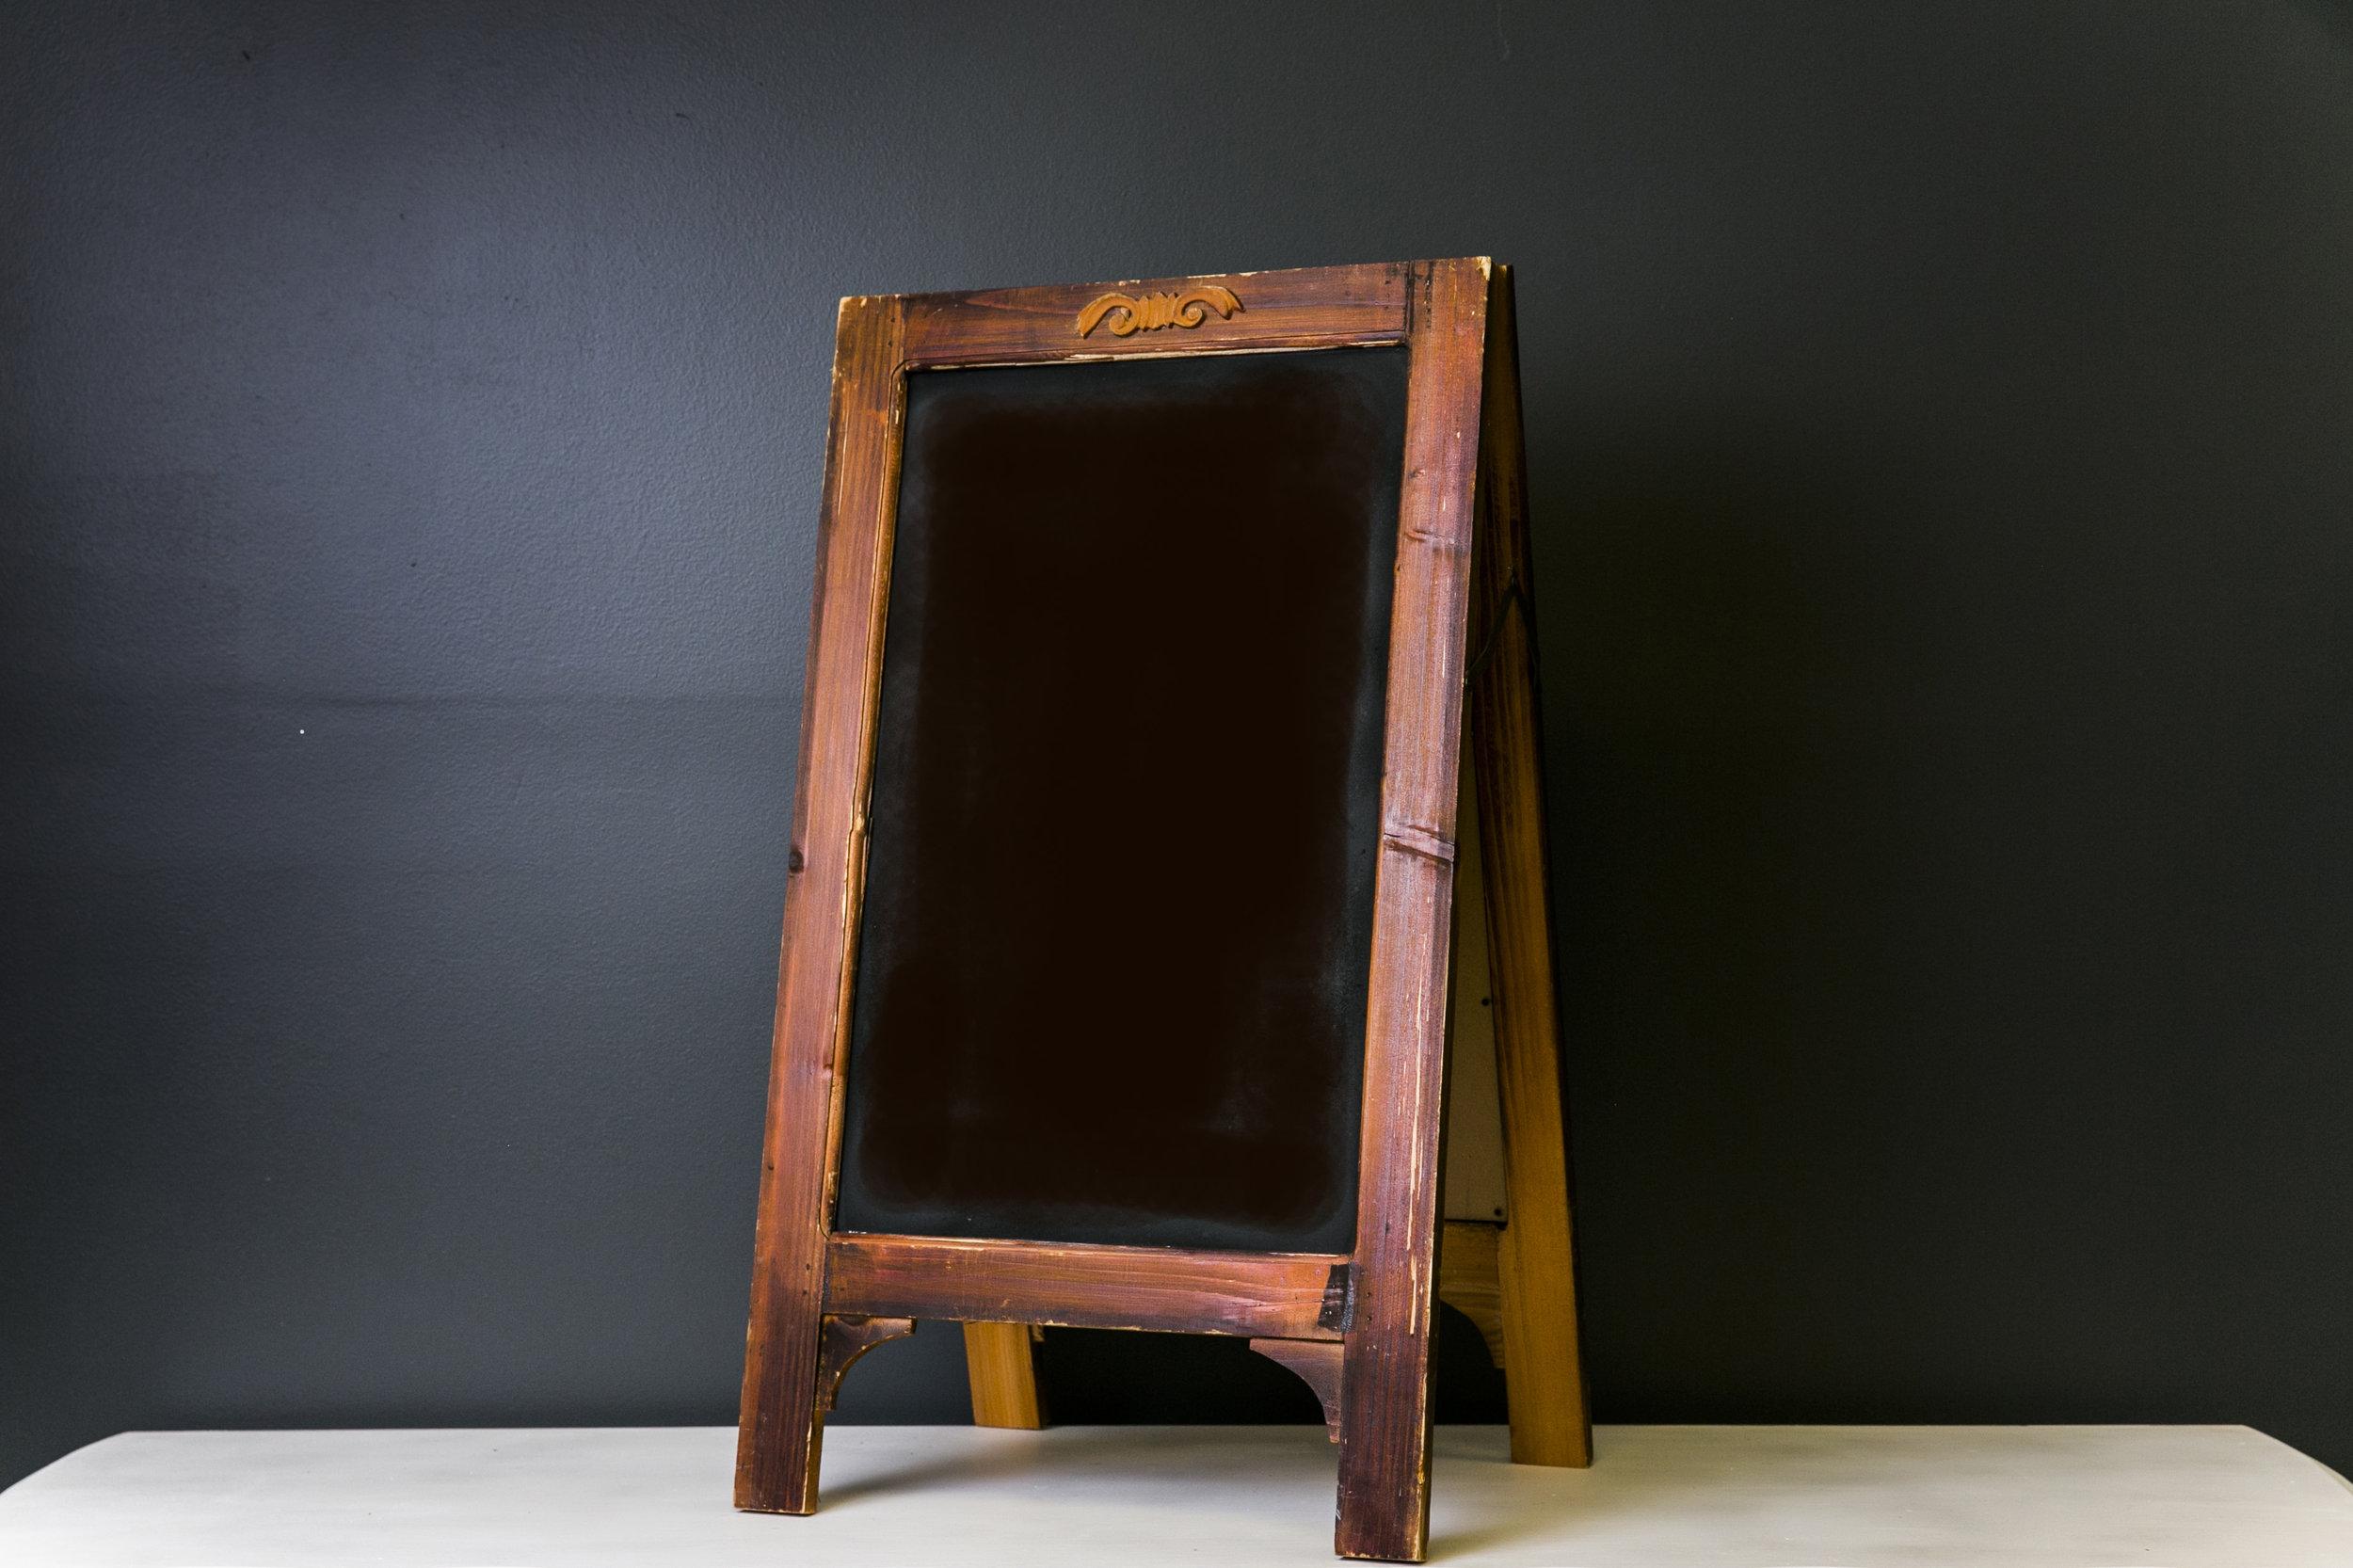 Bennet A-Frame Chalkboard (Brown) 25 x 17 (Quantity 2)